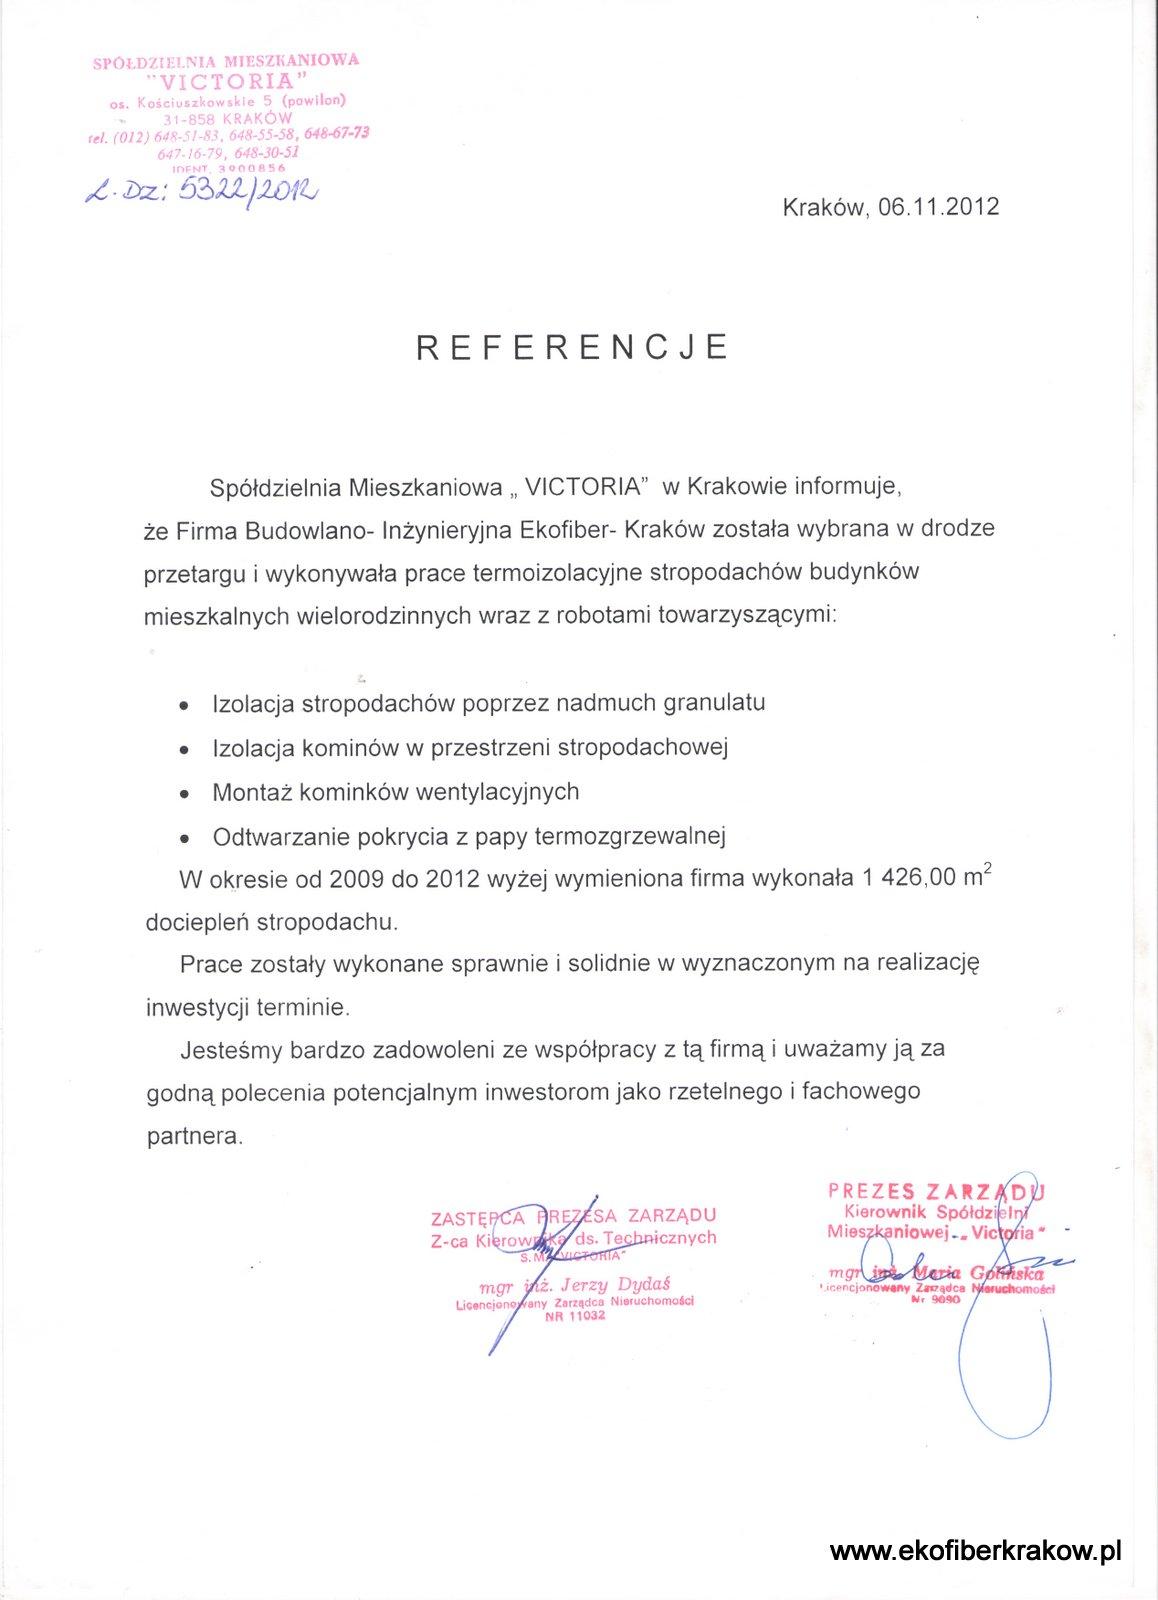 Referencje SM Victoria Kraków